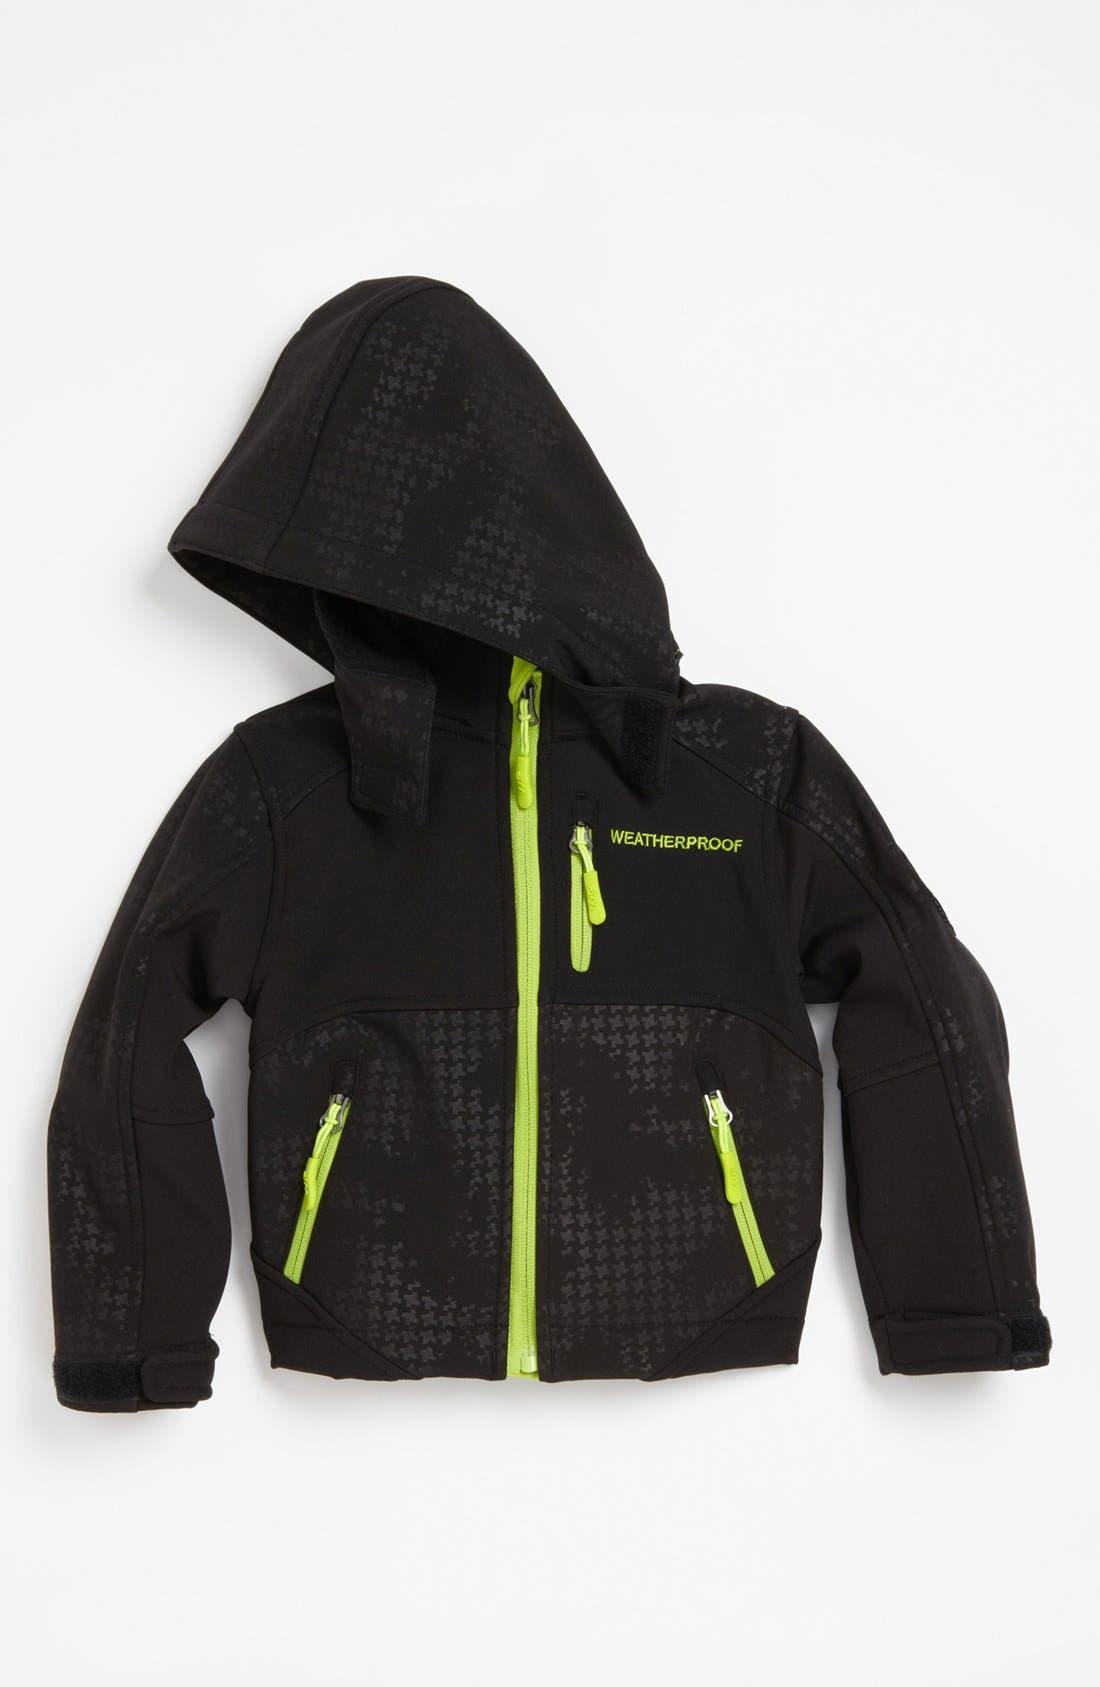 Main Image - Weatherproof® Shell Jacket (Toddler Boys)